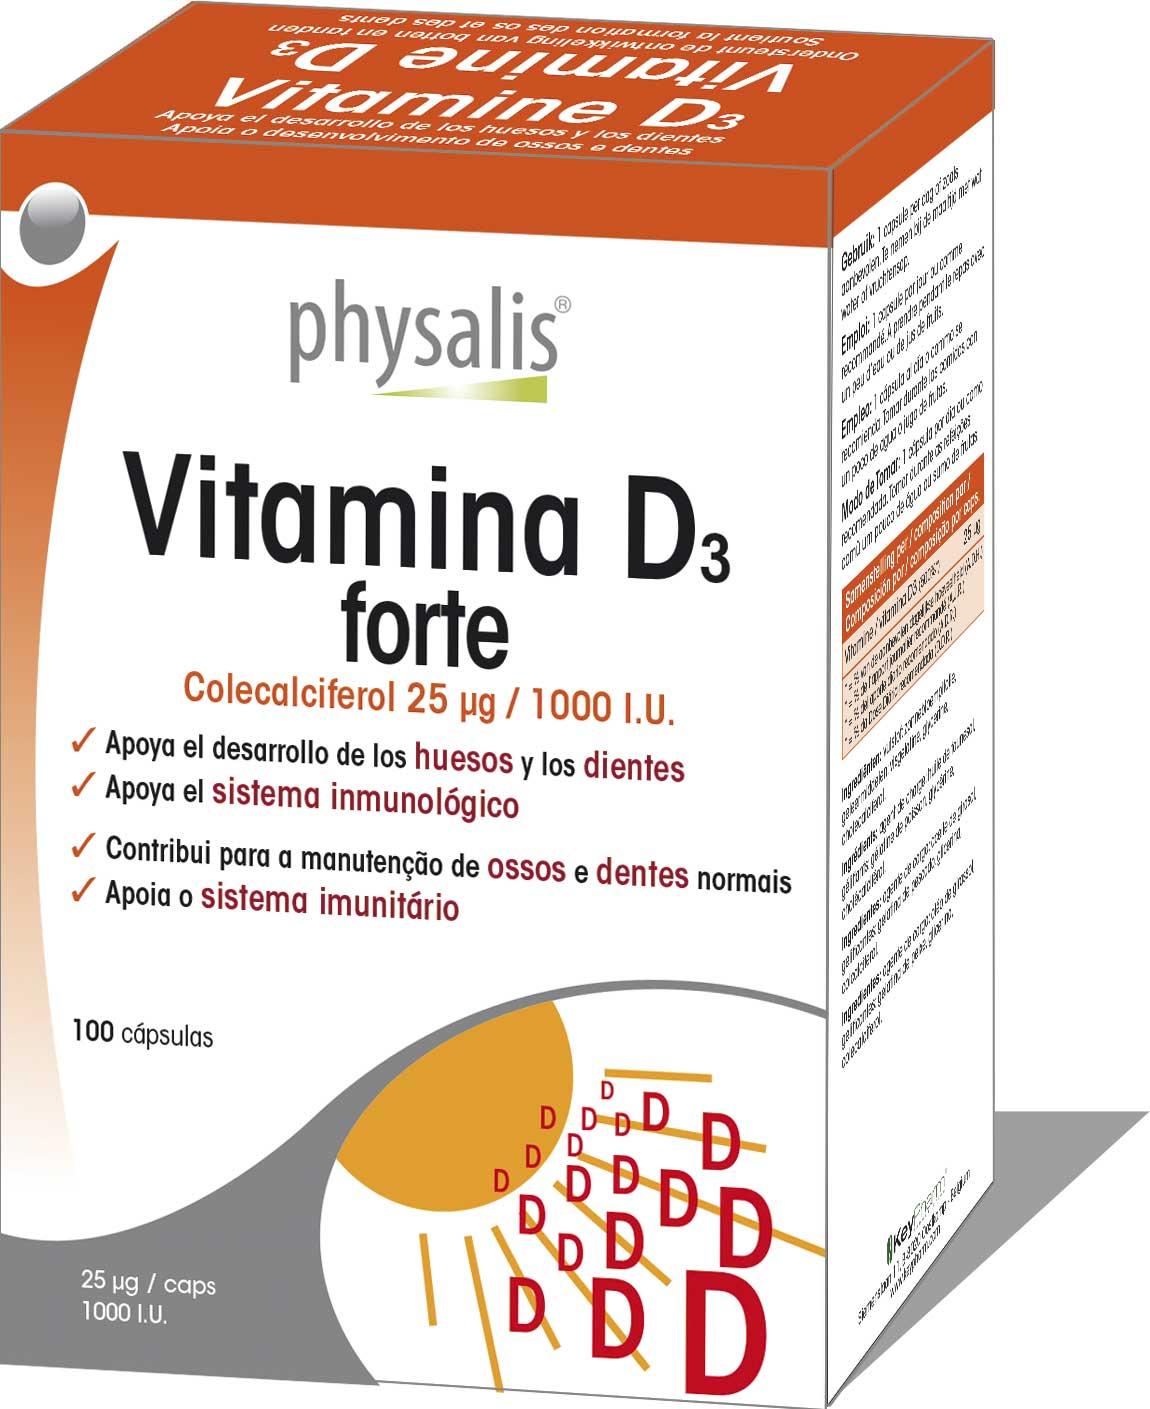 Vitamina D3 forte  Keypharm Complementos alimenticios naturales